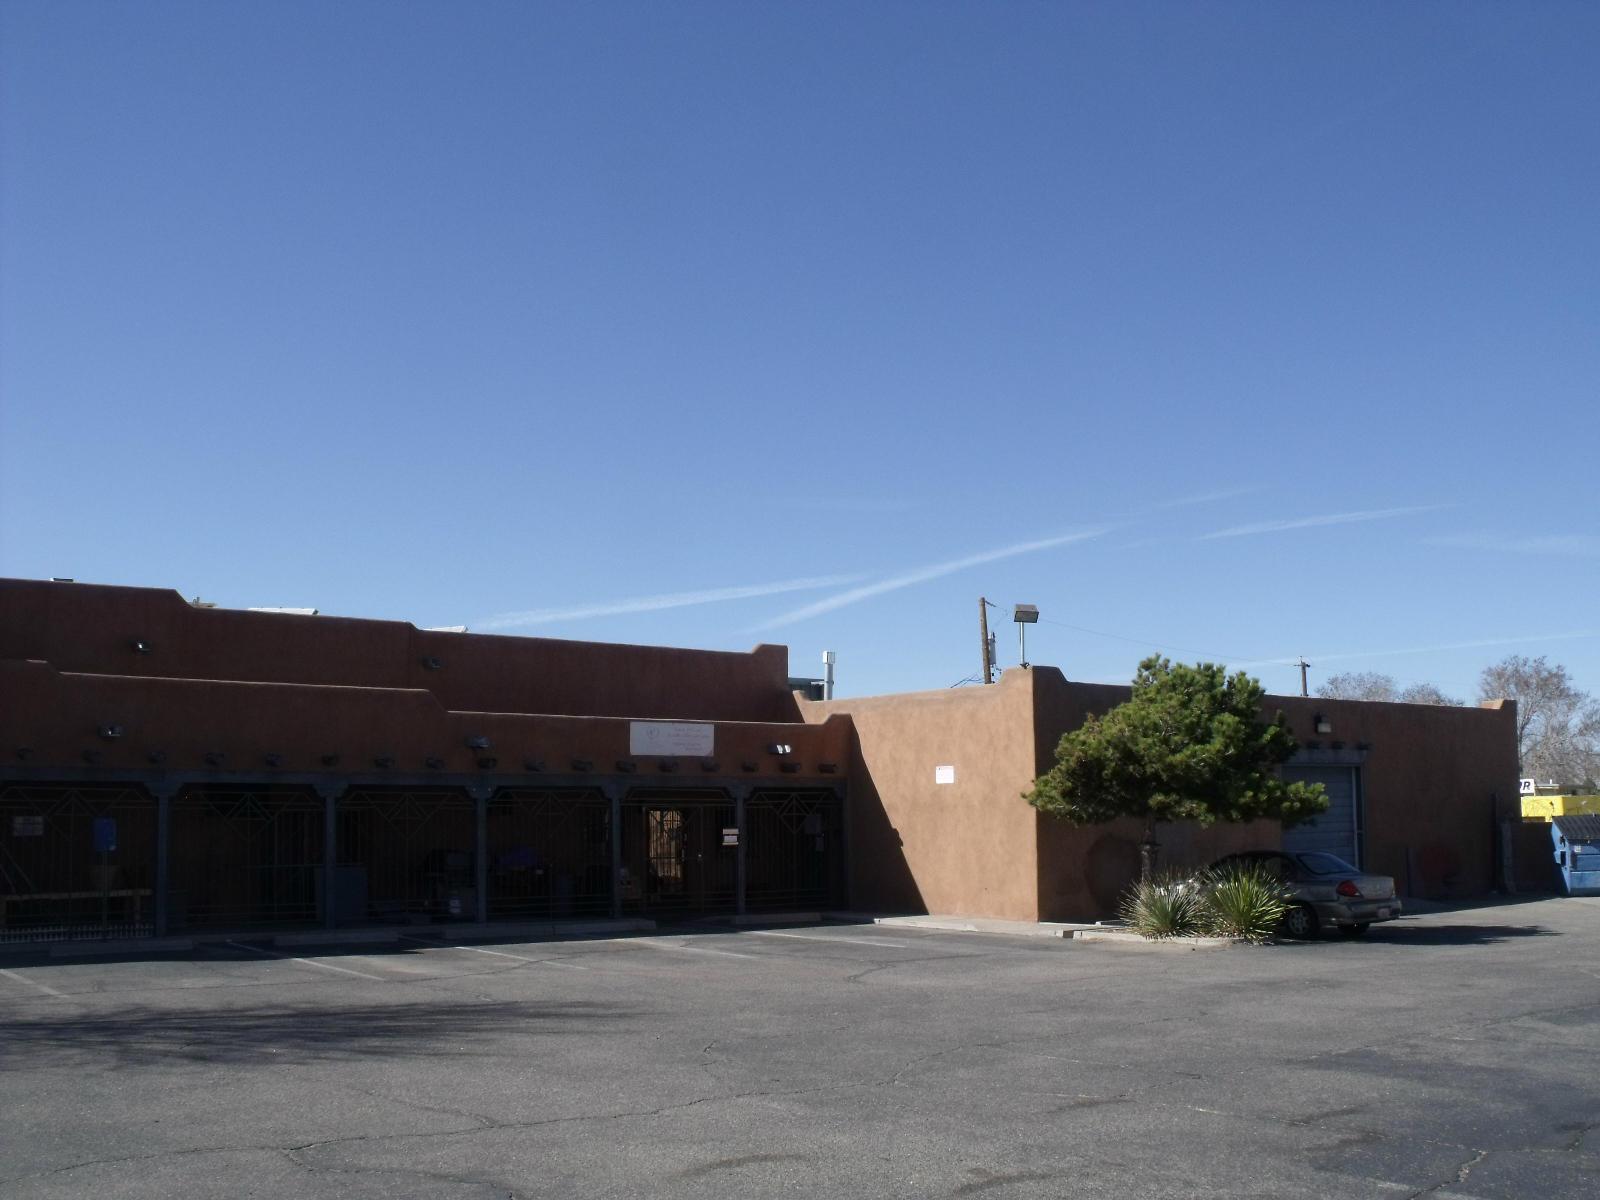 8011 Central Avenue NE, Albuquerque, NM 87108 - Albuquerque, NM real estate listing